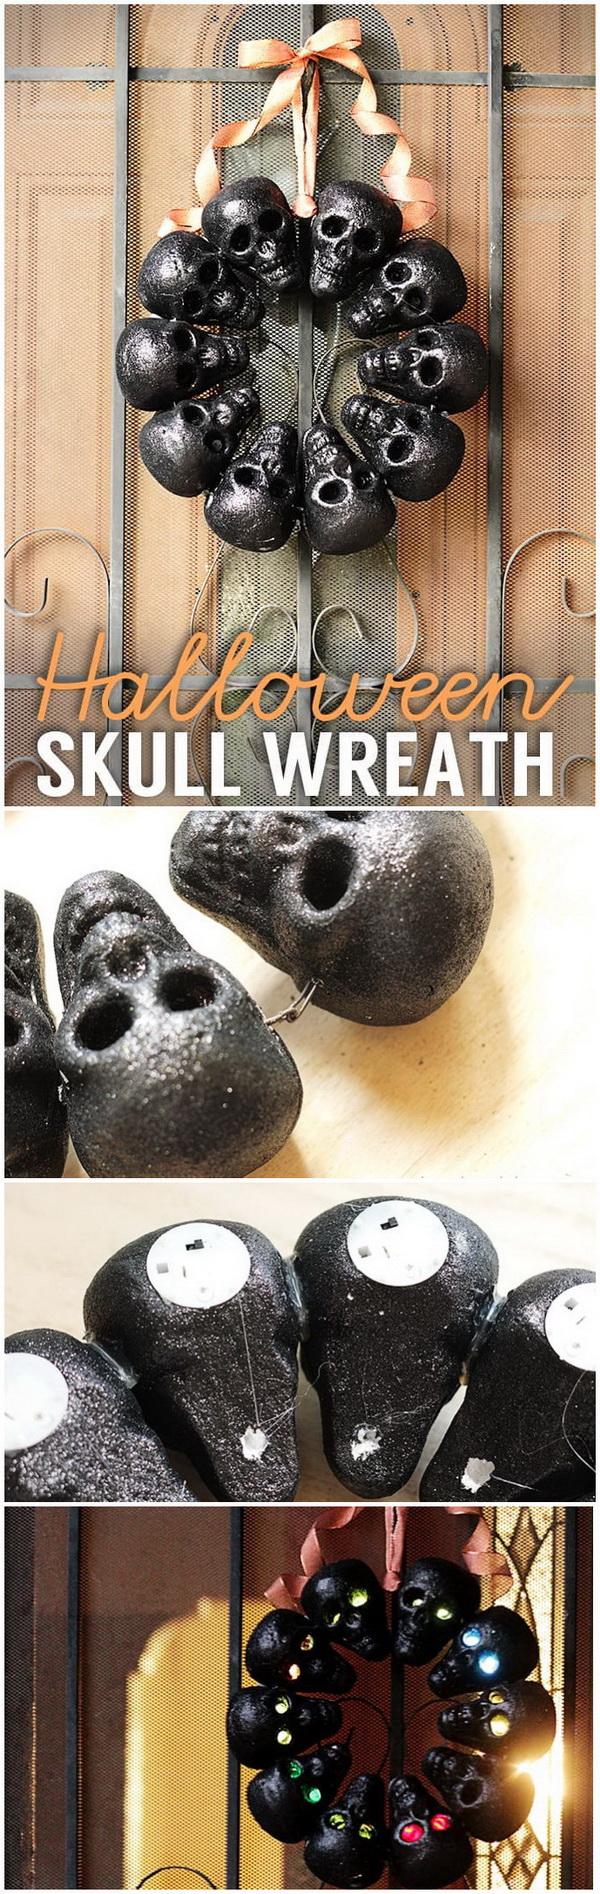 DIY Halloween Decorating Projects: Halloween Skull Wreath.